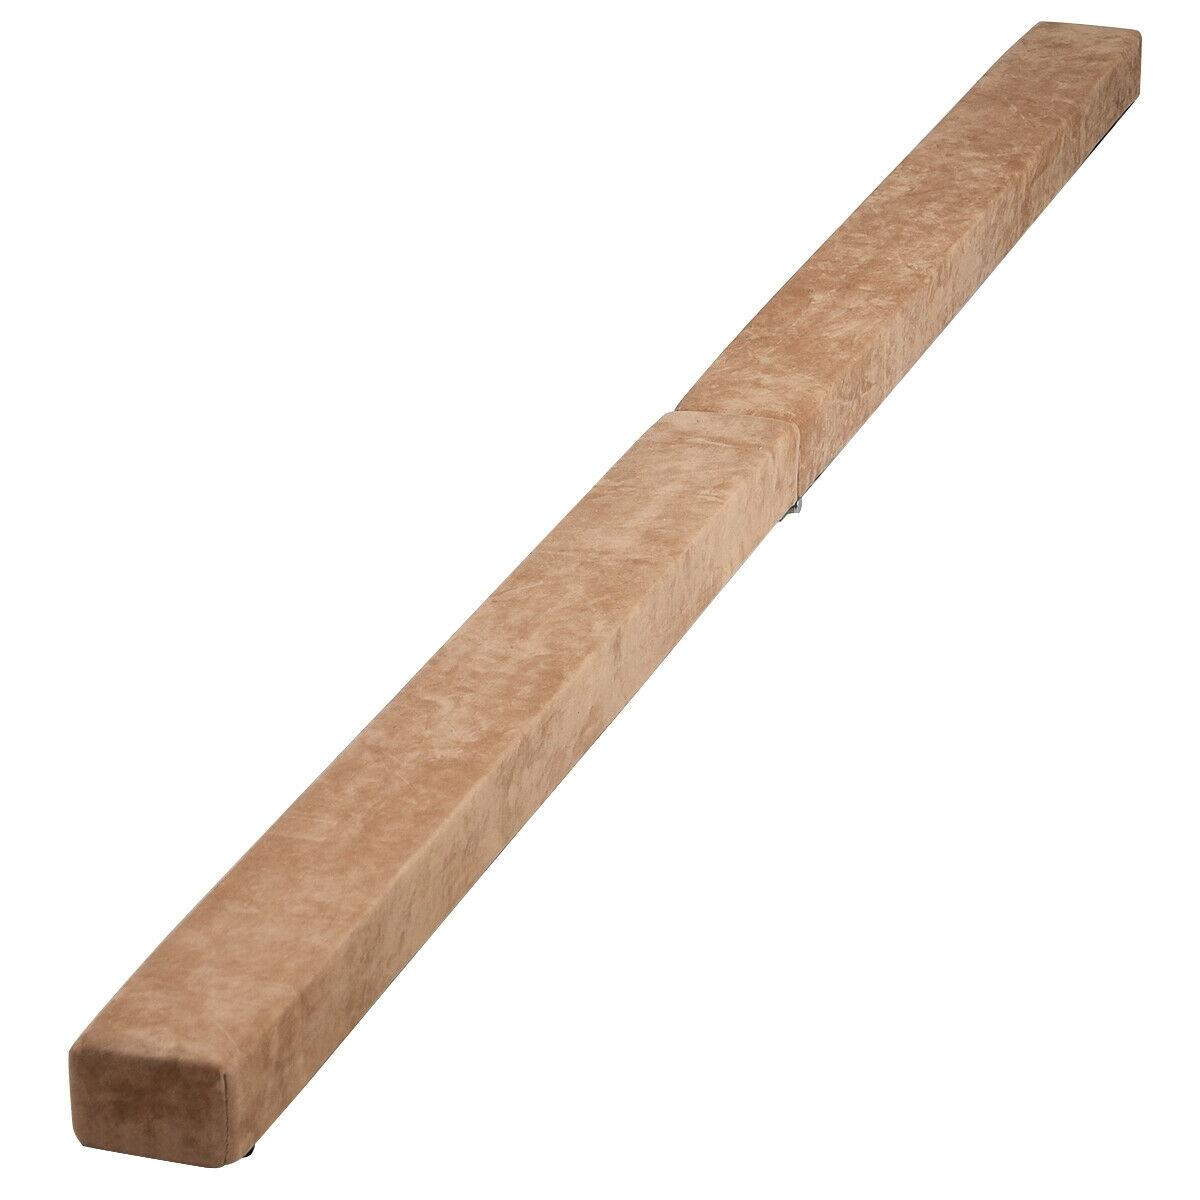 7' Sectional Gymnastics Floor Balance Beam